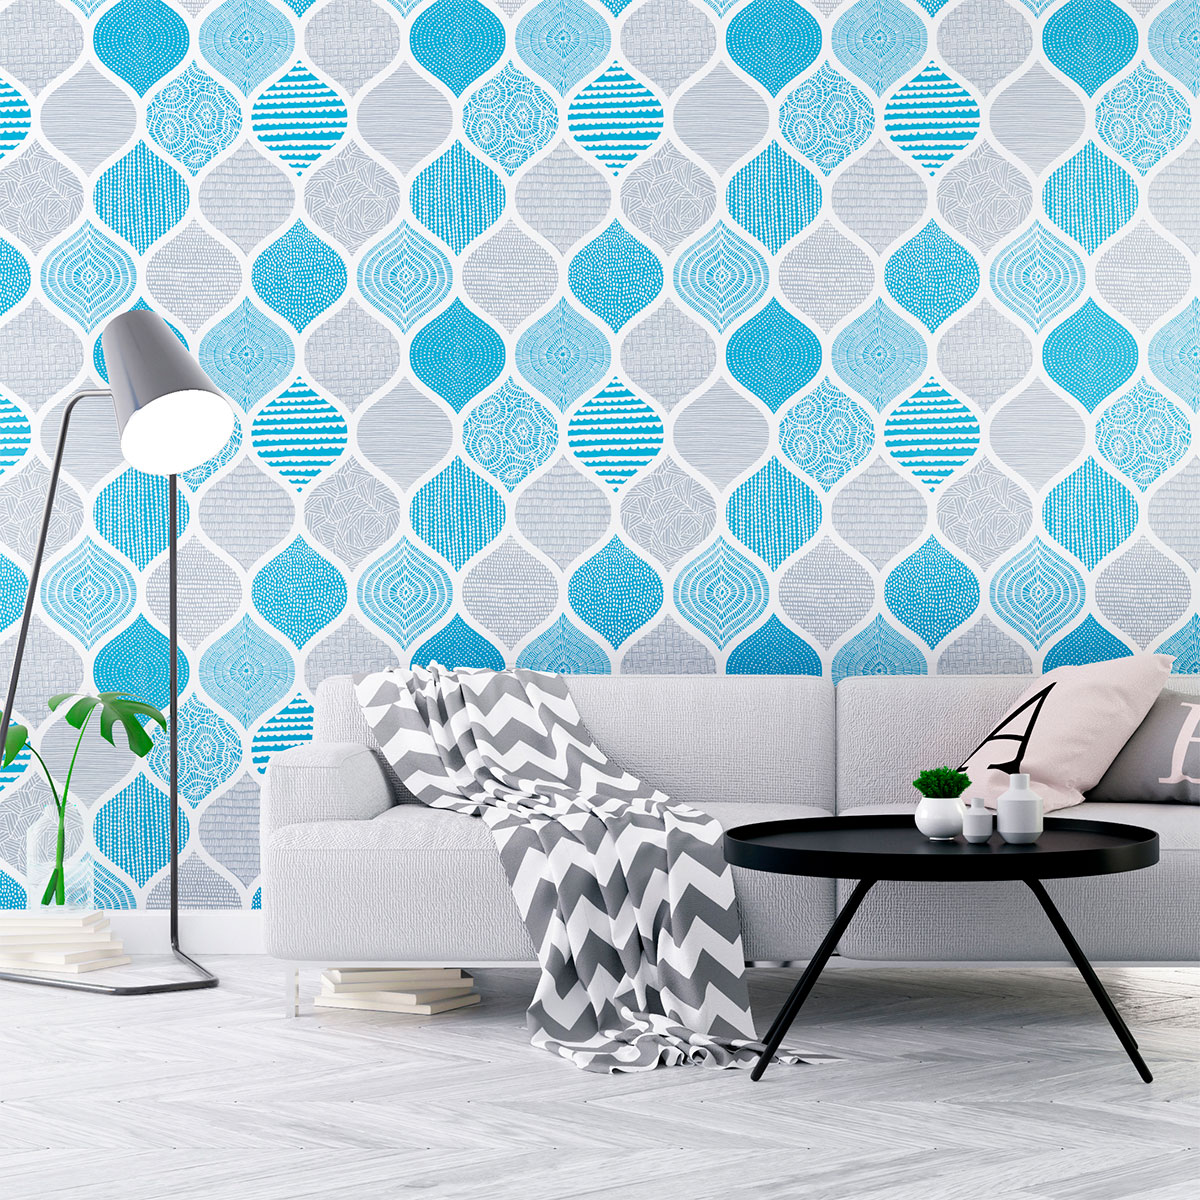 sticker papier peint scandinave egil salon design ambiance sticker. Black Bedroom Furniture Sets. Home Design Ideas